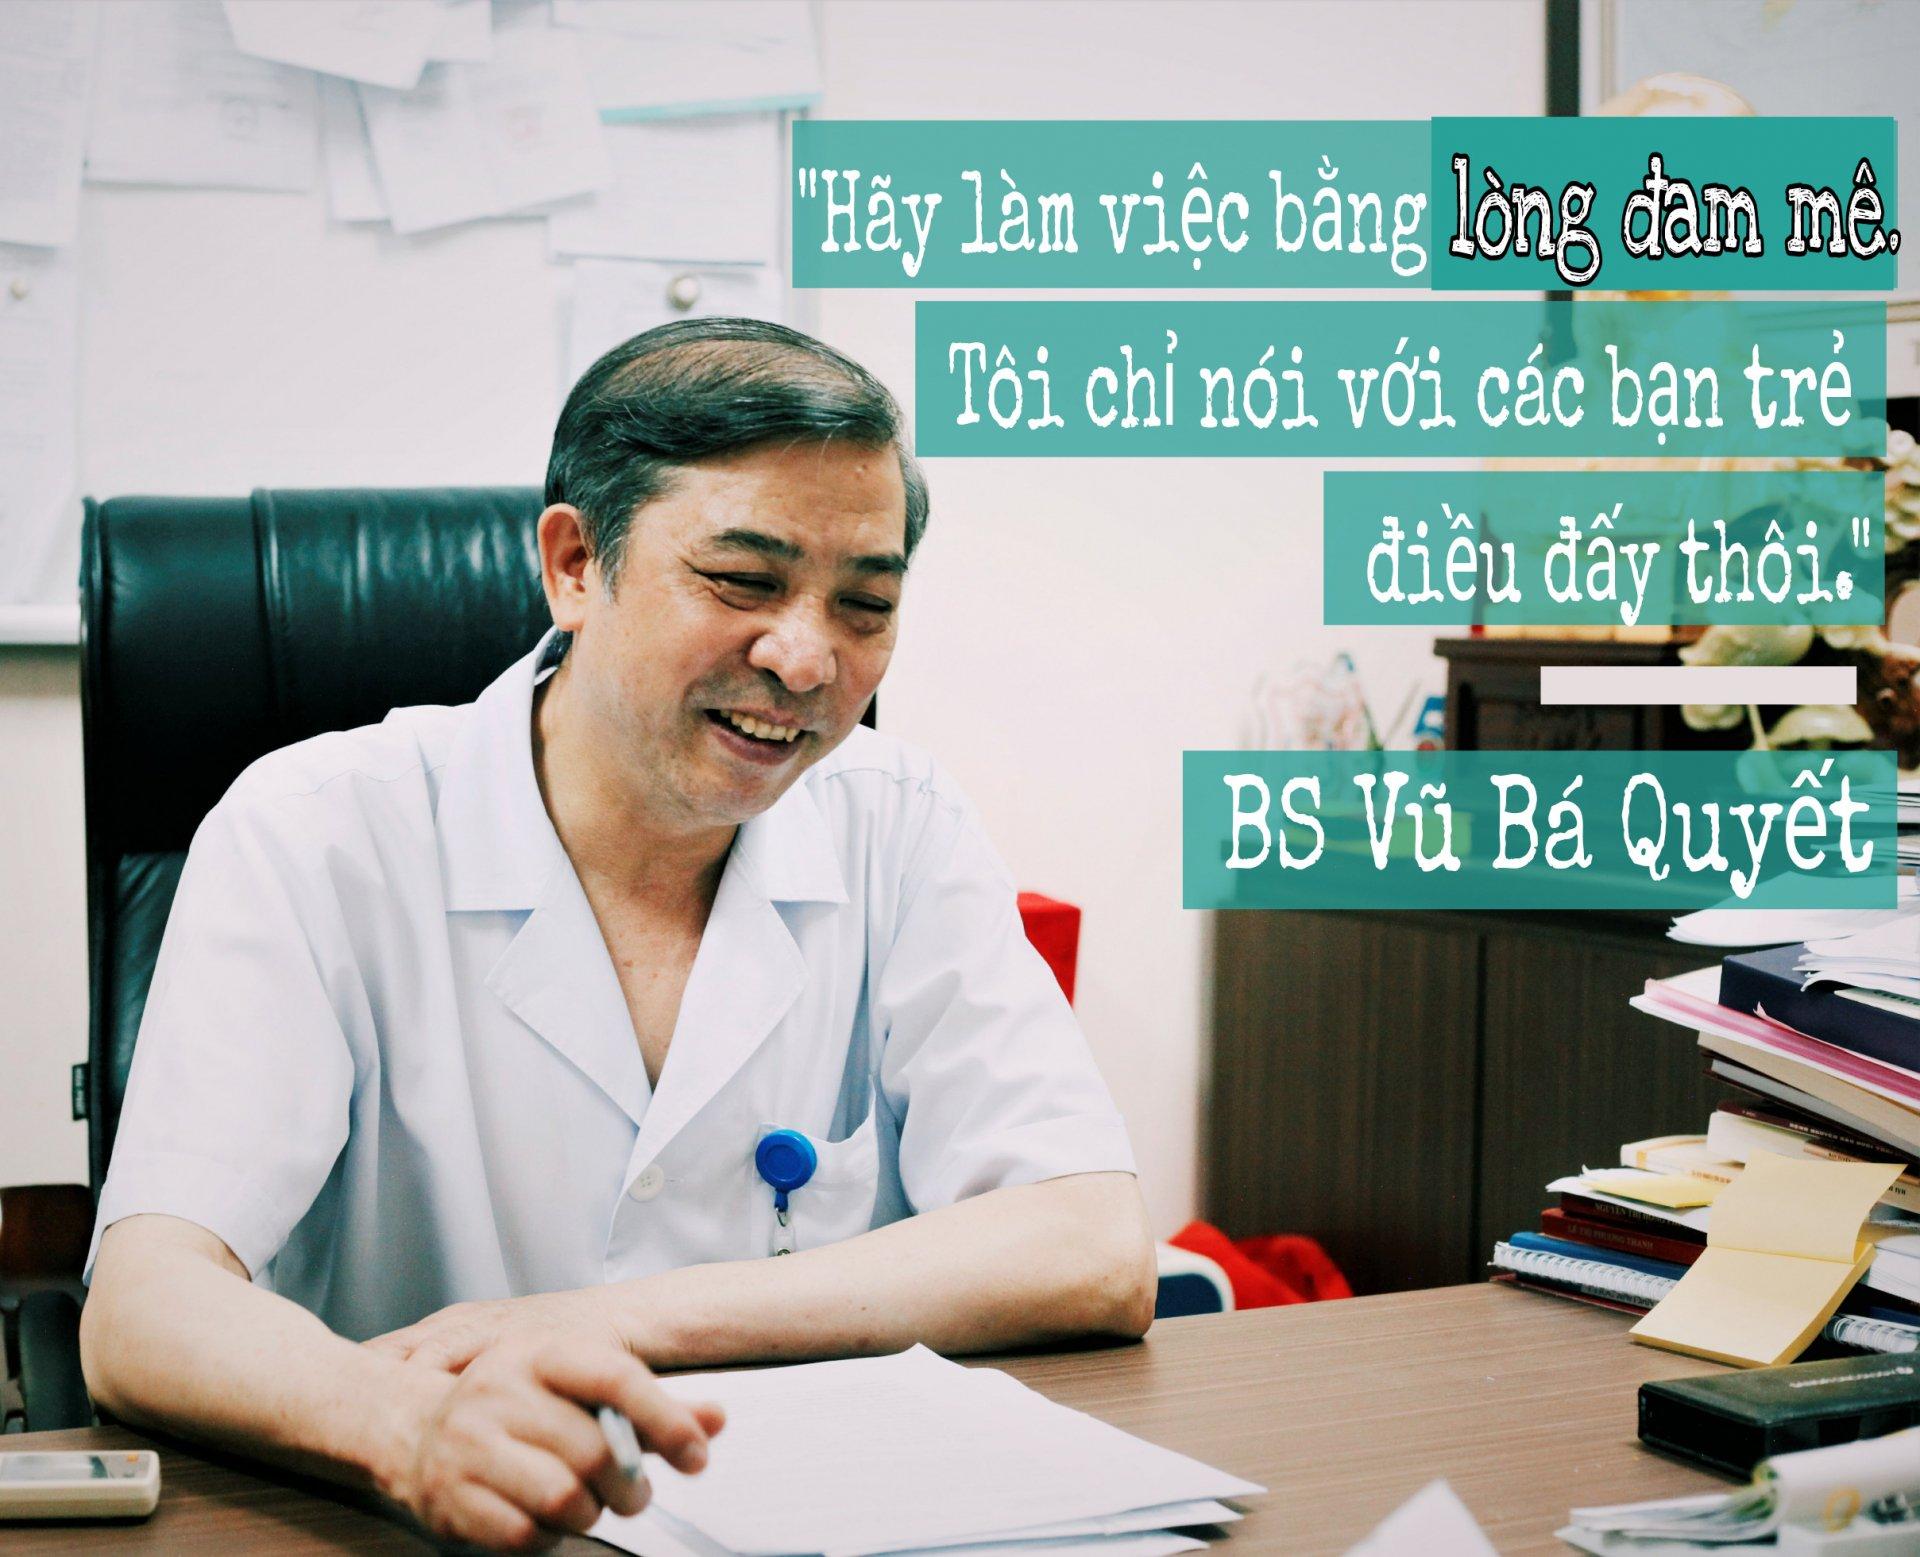 Giam doc Benh vien Phu san Trung uong bat mi hang loat chuyen 'lam dep cho phu nu' hinh anh 5